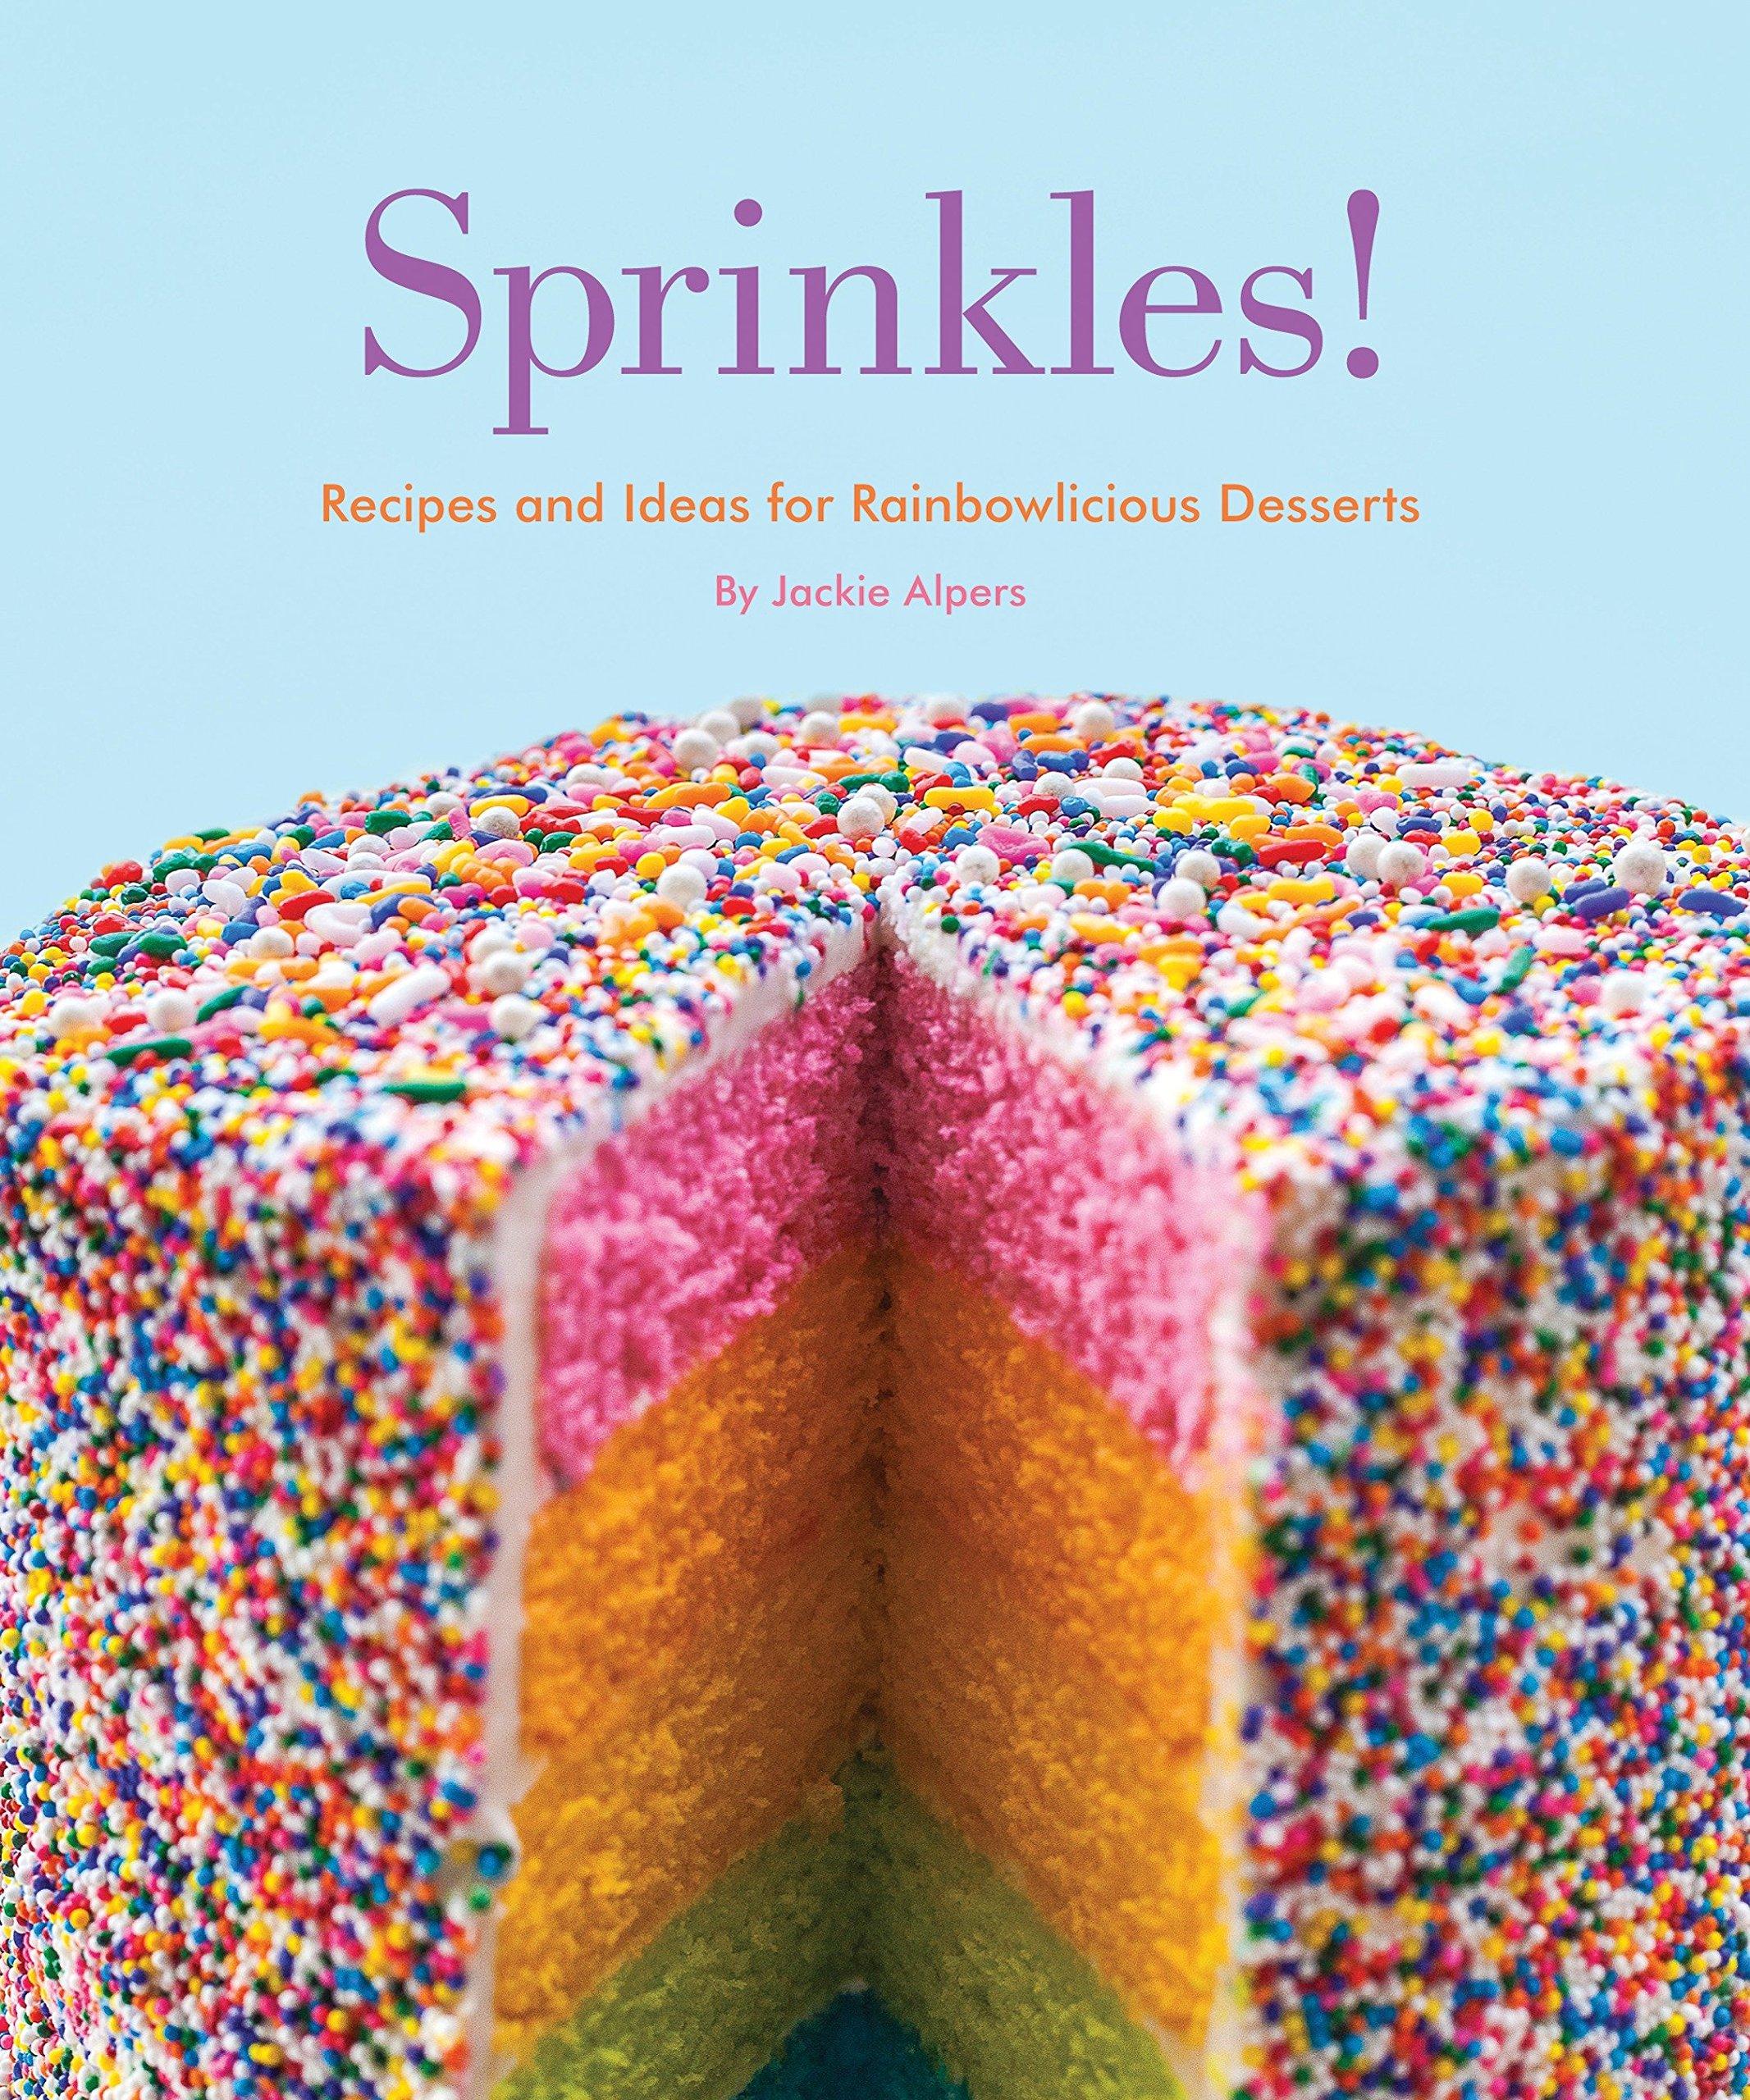 Sprinkles!: Recipes and Ideas for Rainbowlicious Desserts ebook